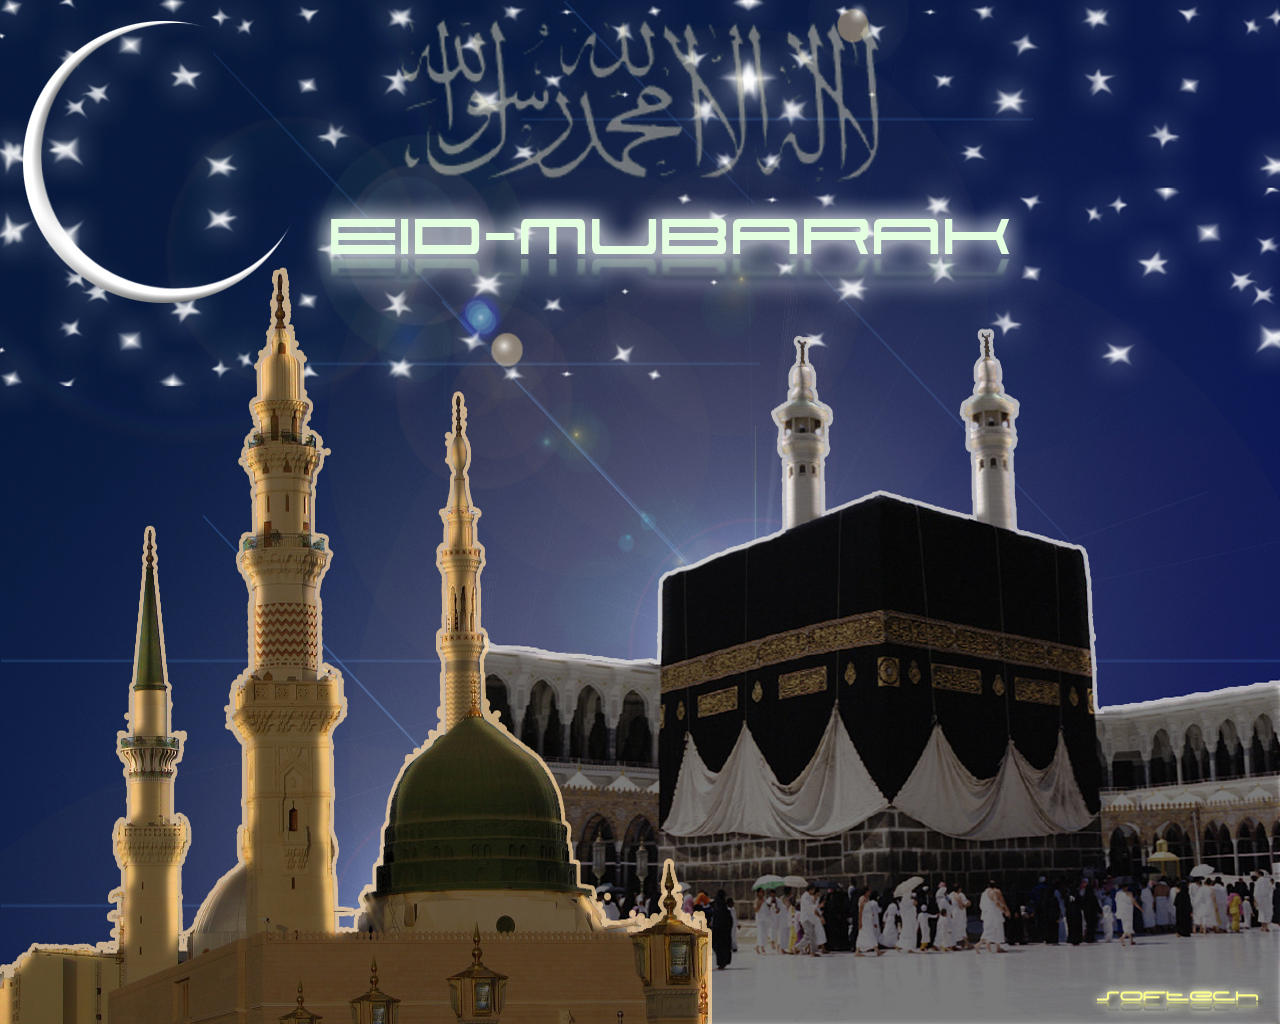 http://fc02.deviantart.net/fs12/i/2006/296/4/0/Eid_Mubarak_by_sahtel08.jpg